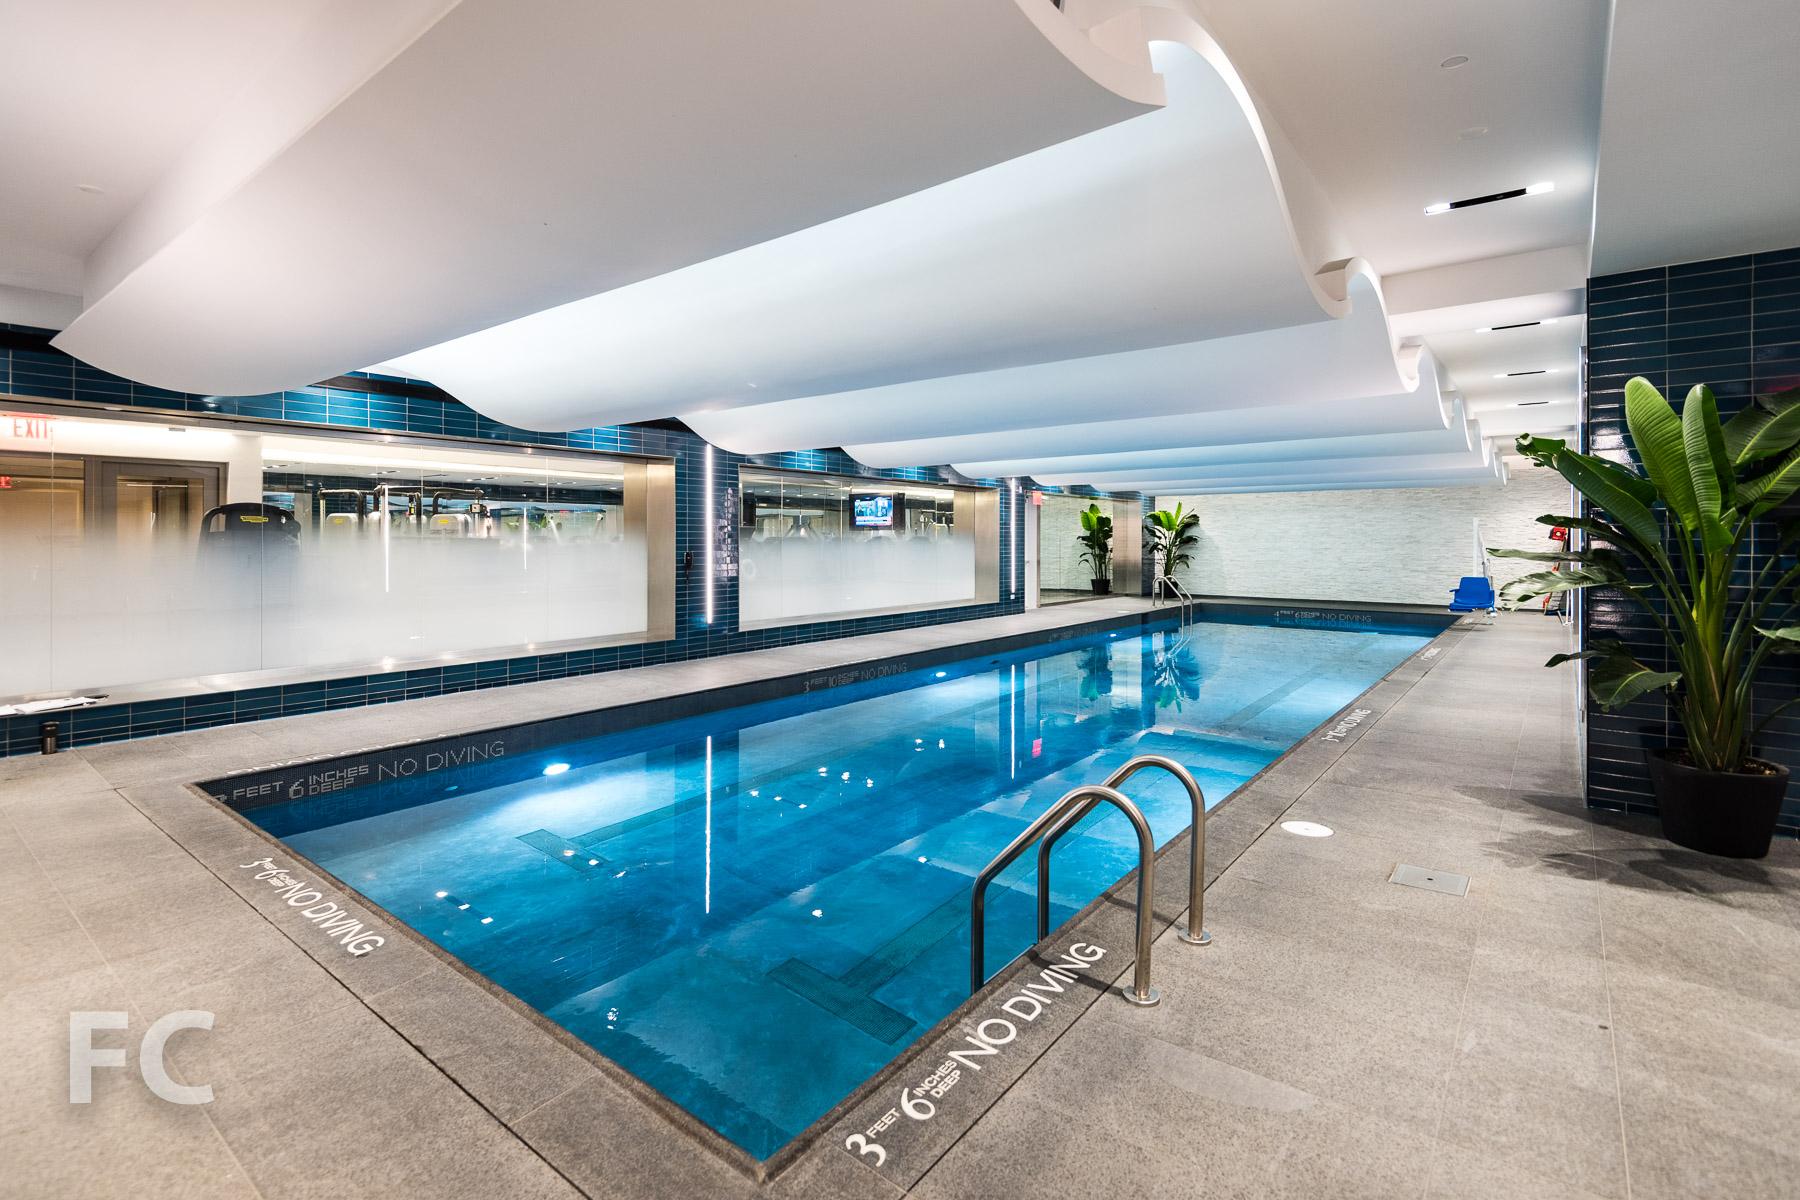 Salt water swimming pool.